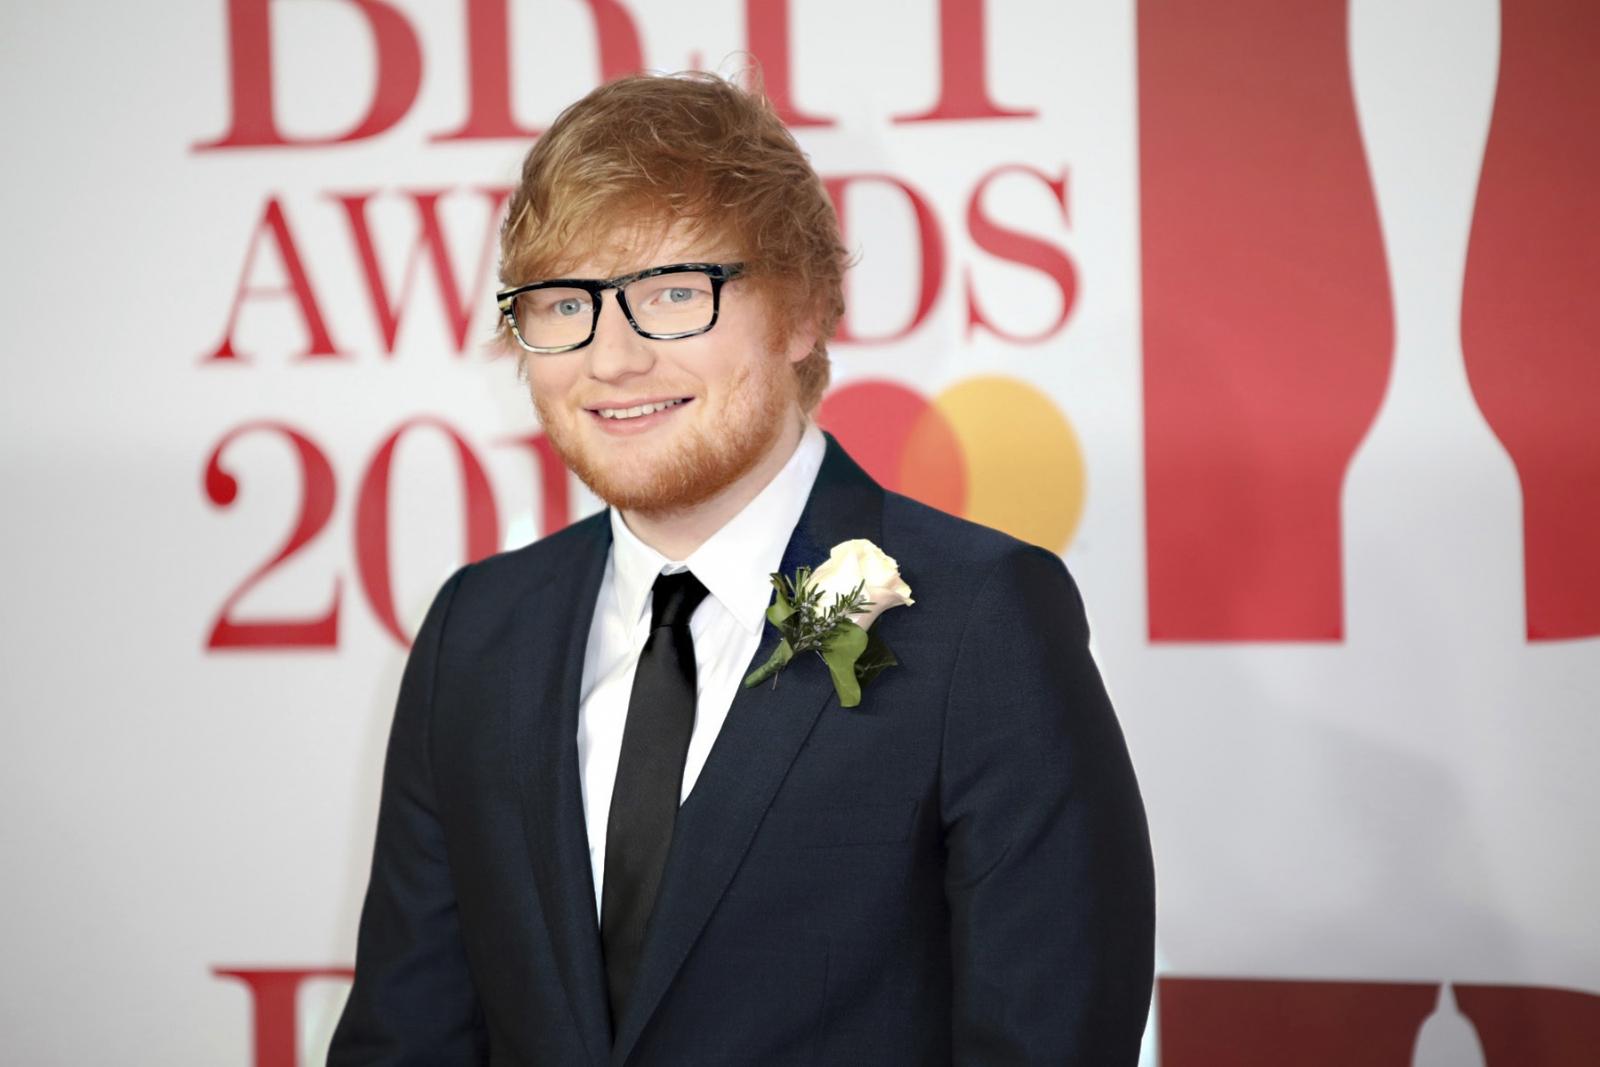 ¿Ed Sheeran se casó en secreto?